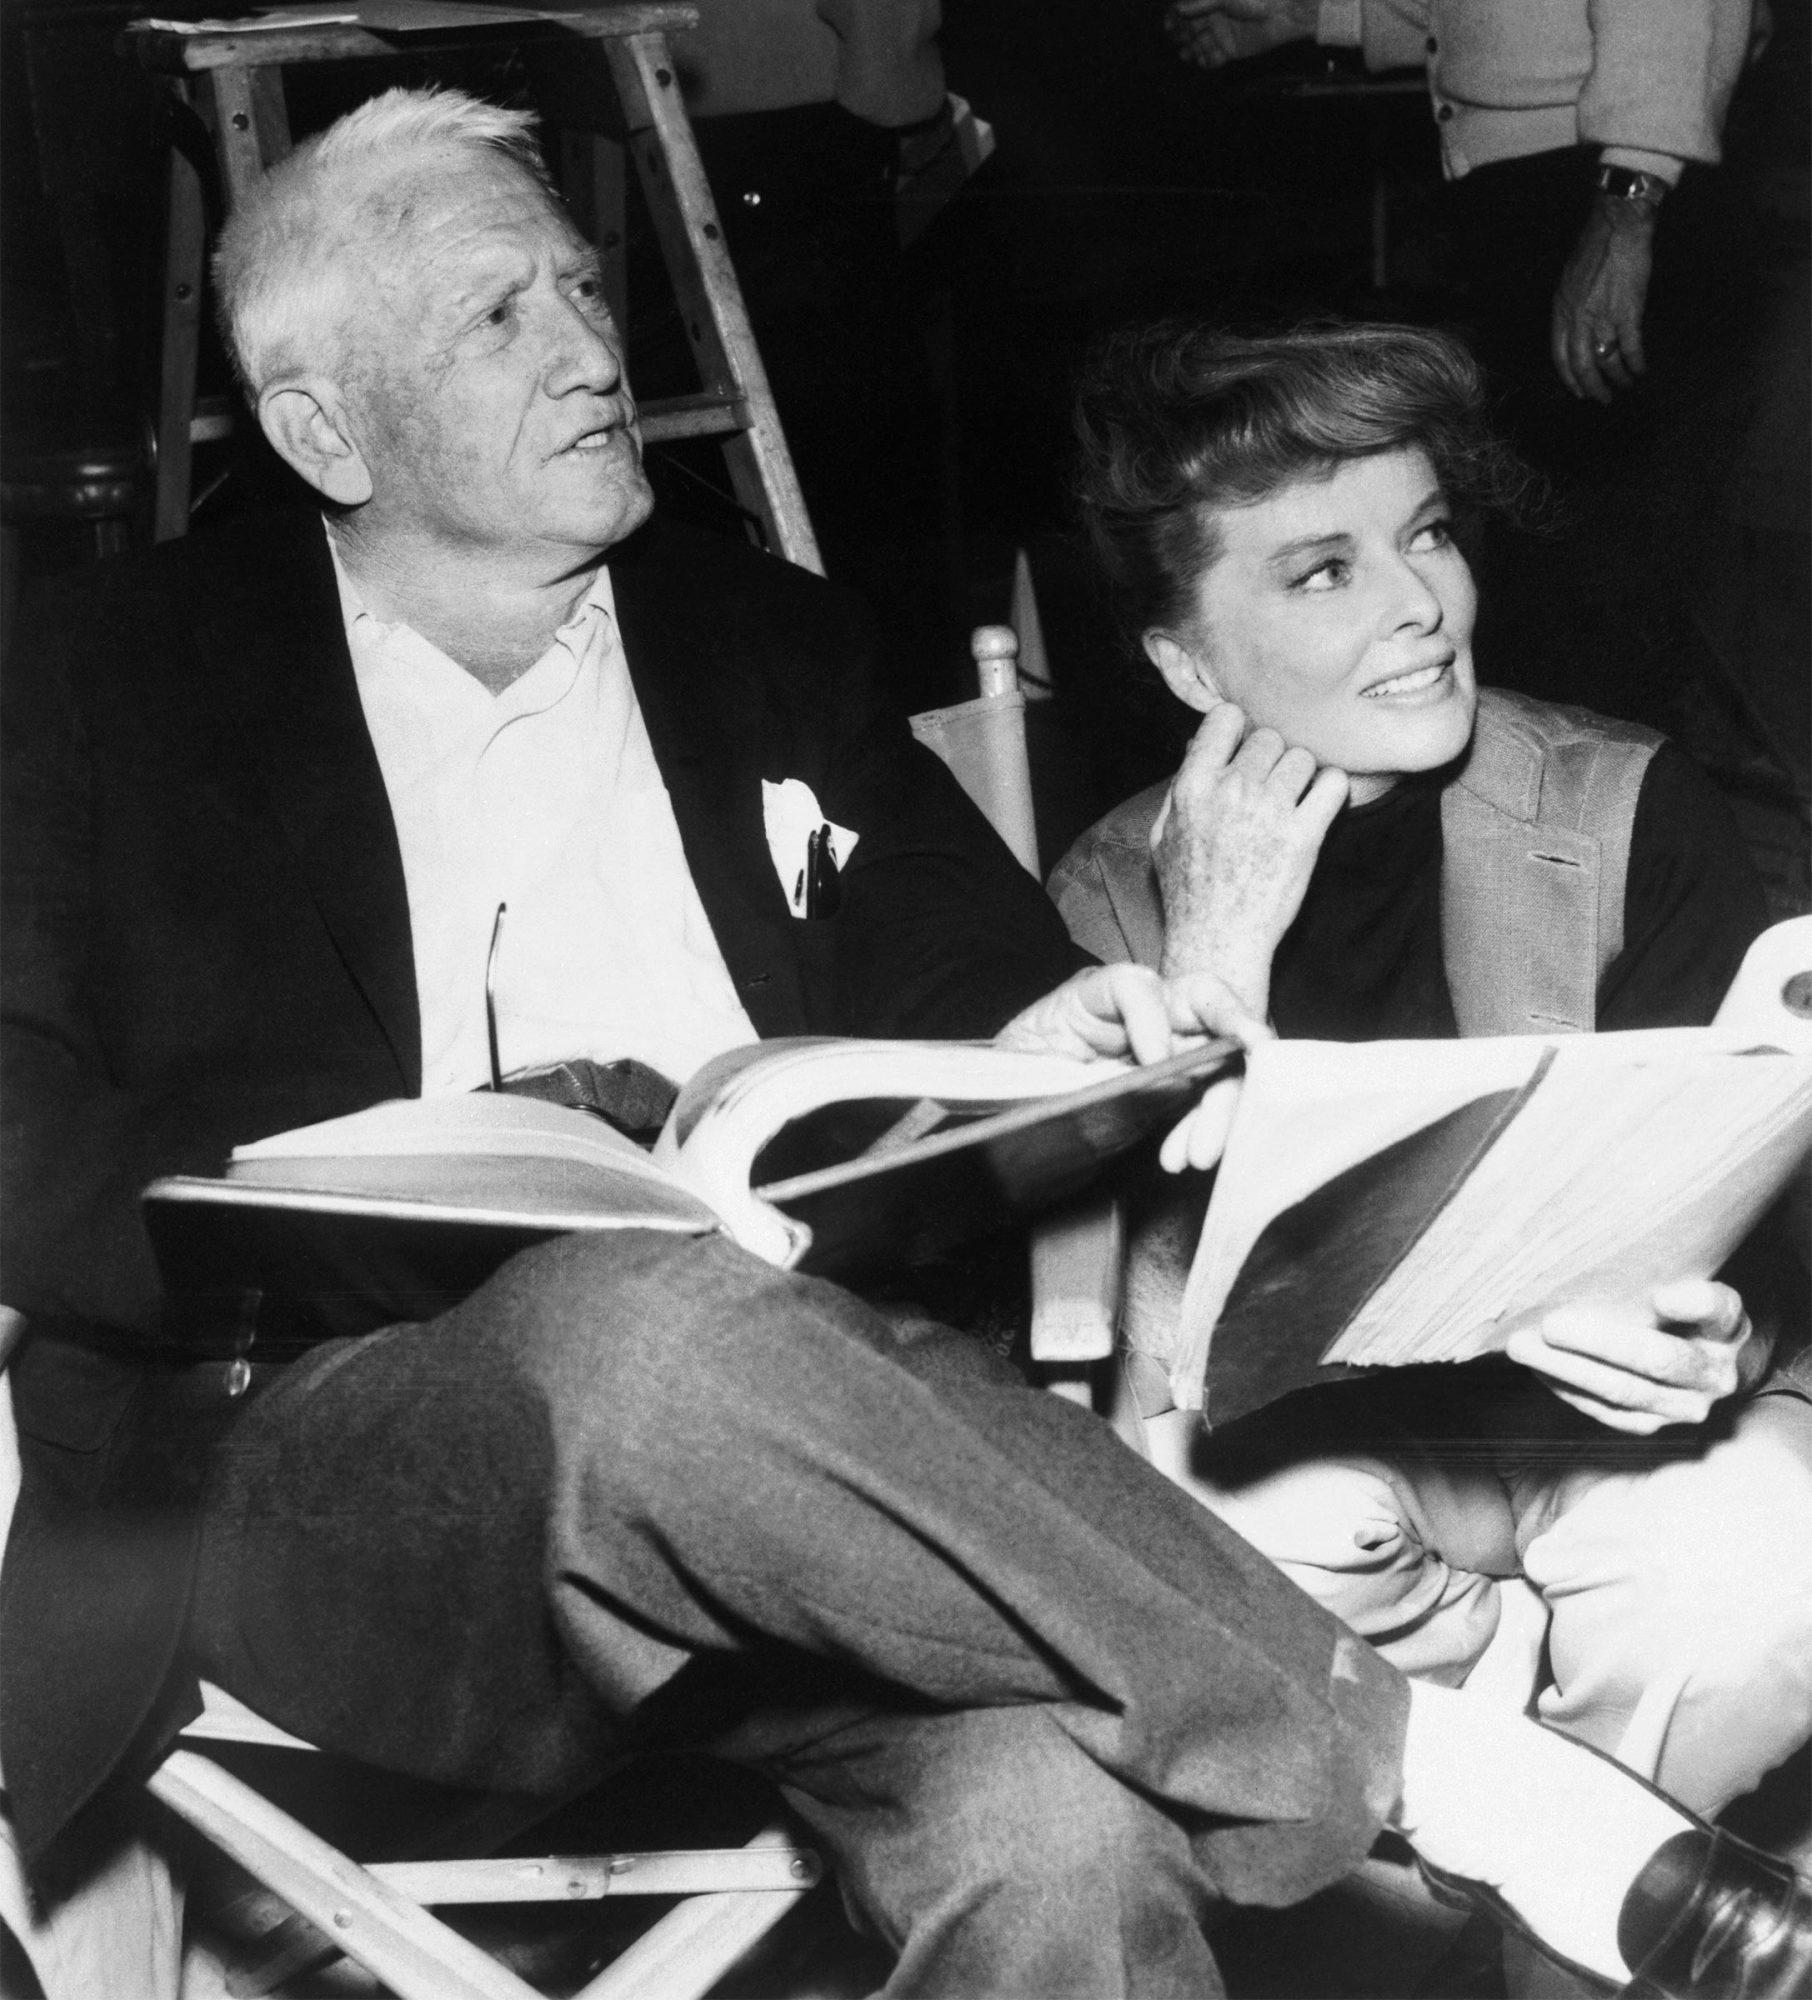 GALLERY: Oscar CouplesKatharine Hepburn with Spencer Tracy on Movie Set